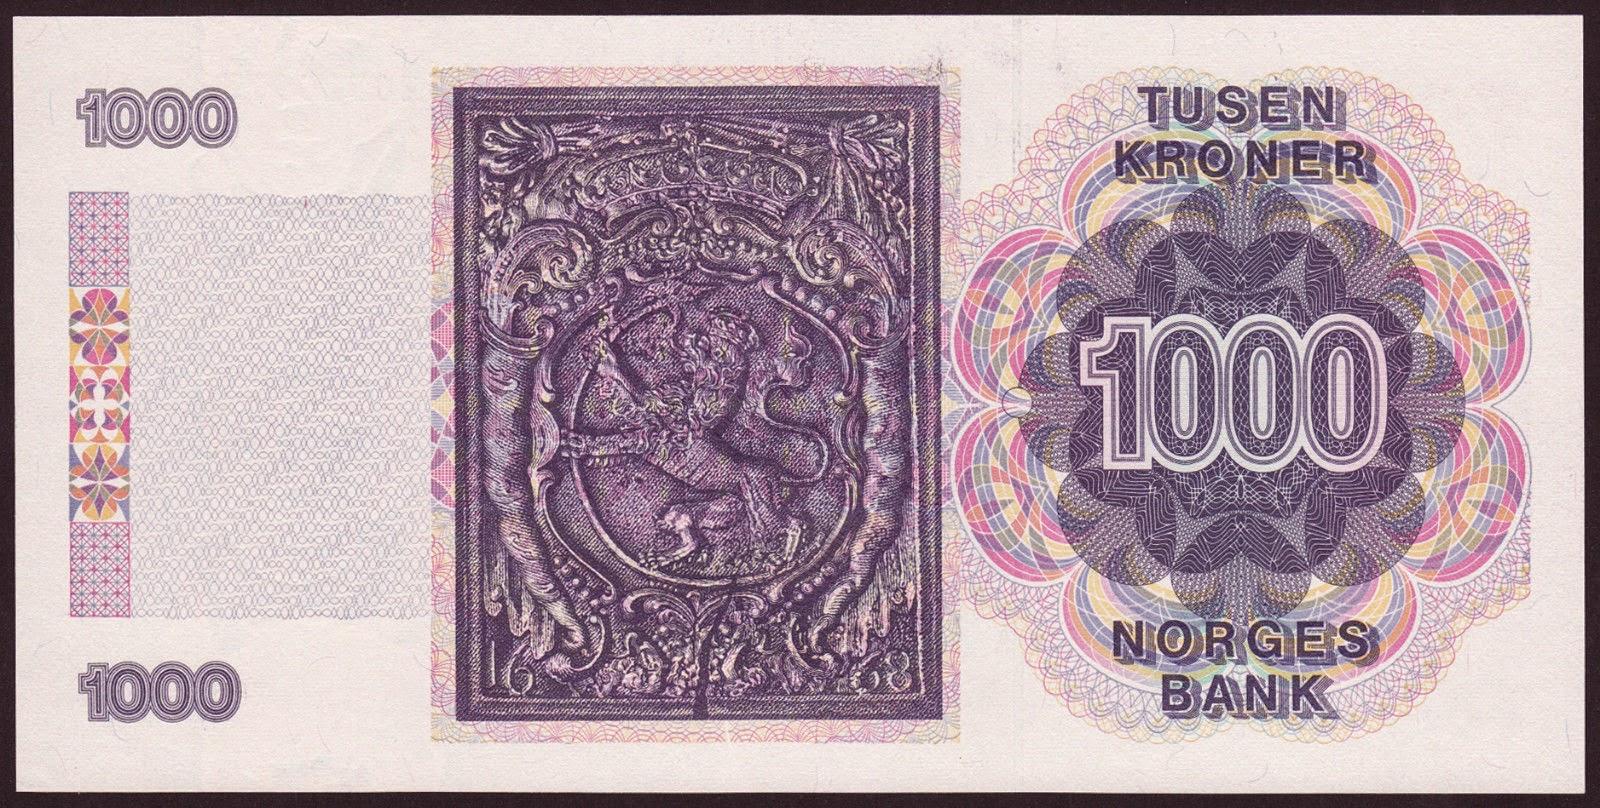 Norway Banknotes 1000 Kroner note